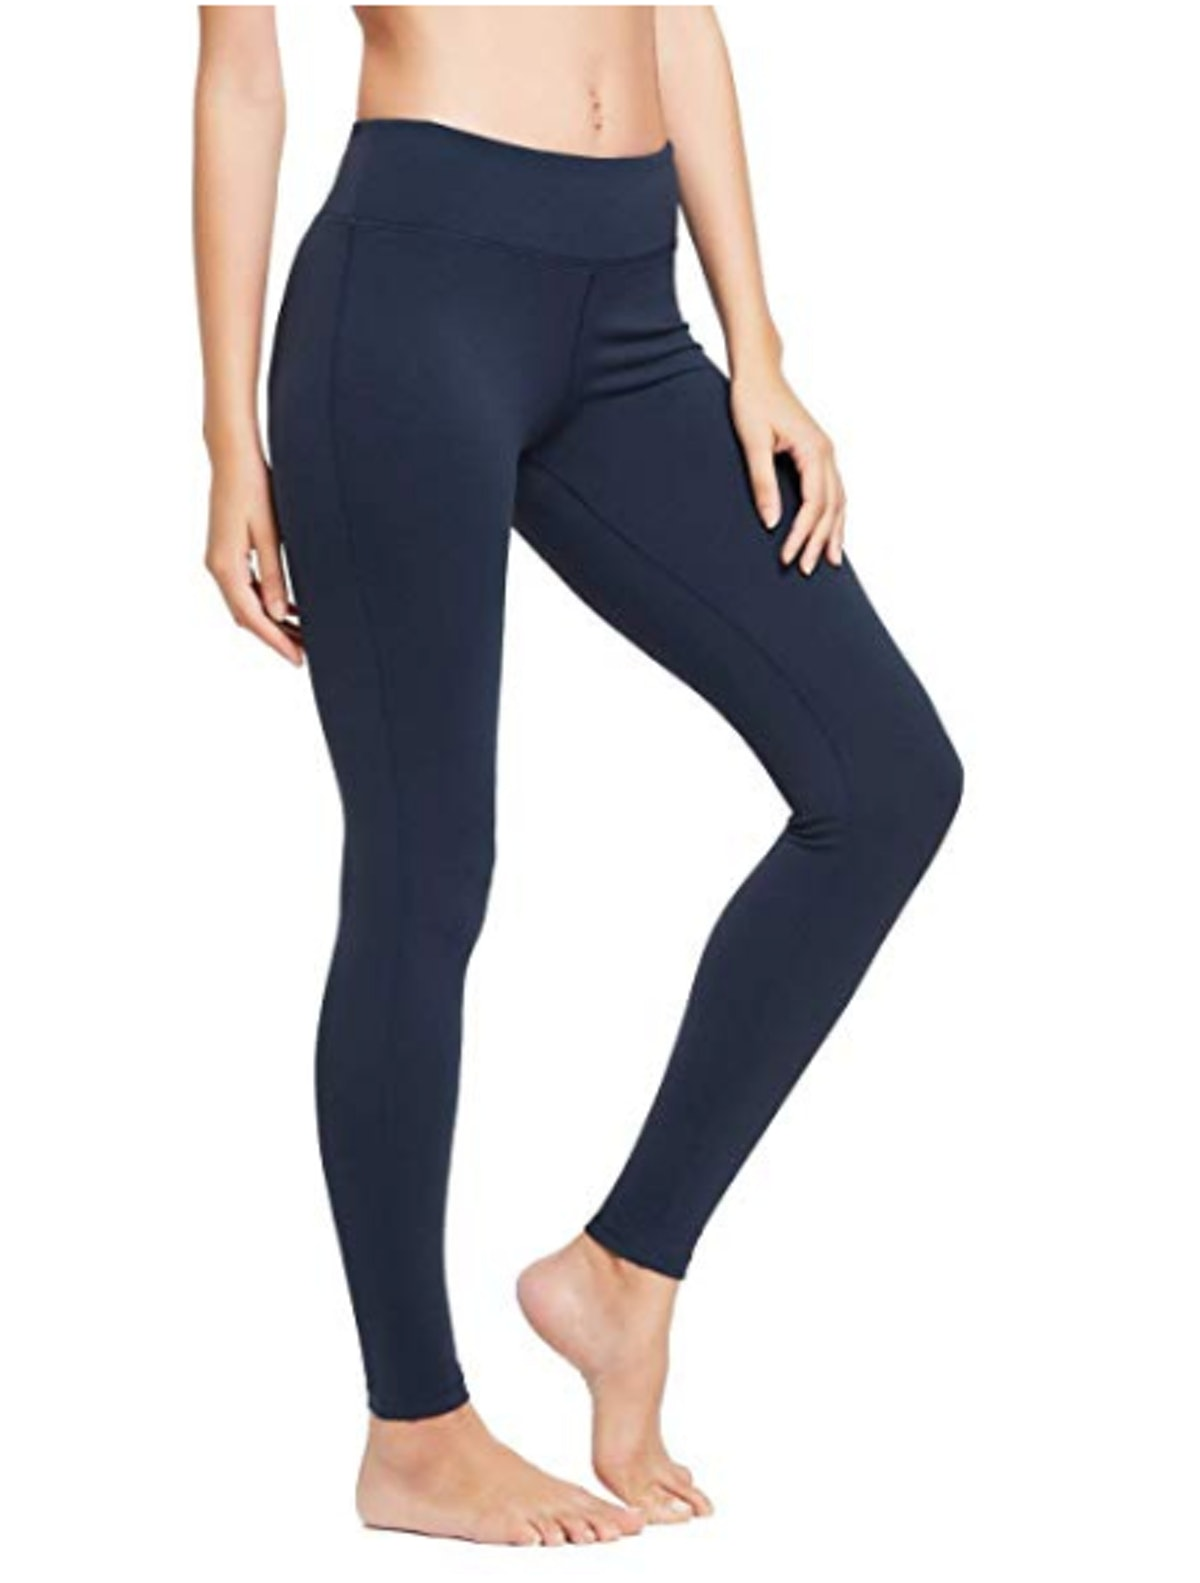 Baleaf High-Waist Yoga Pant